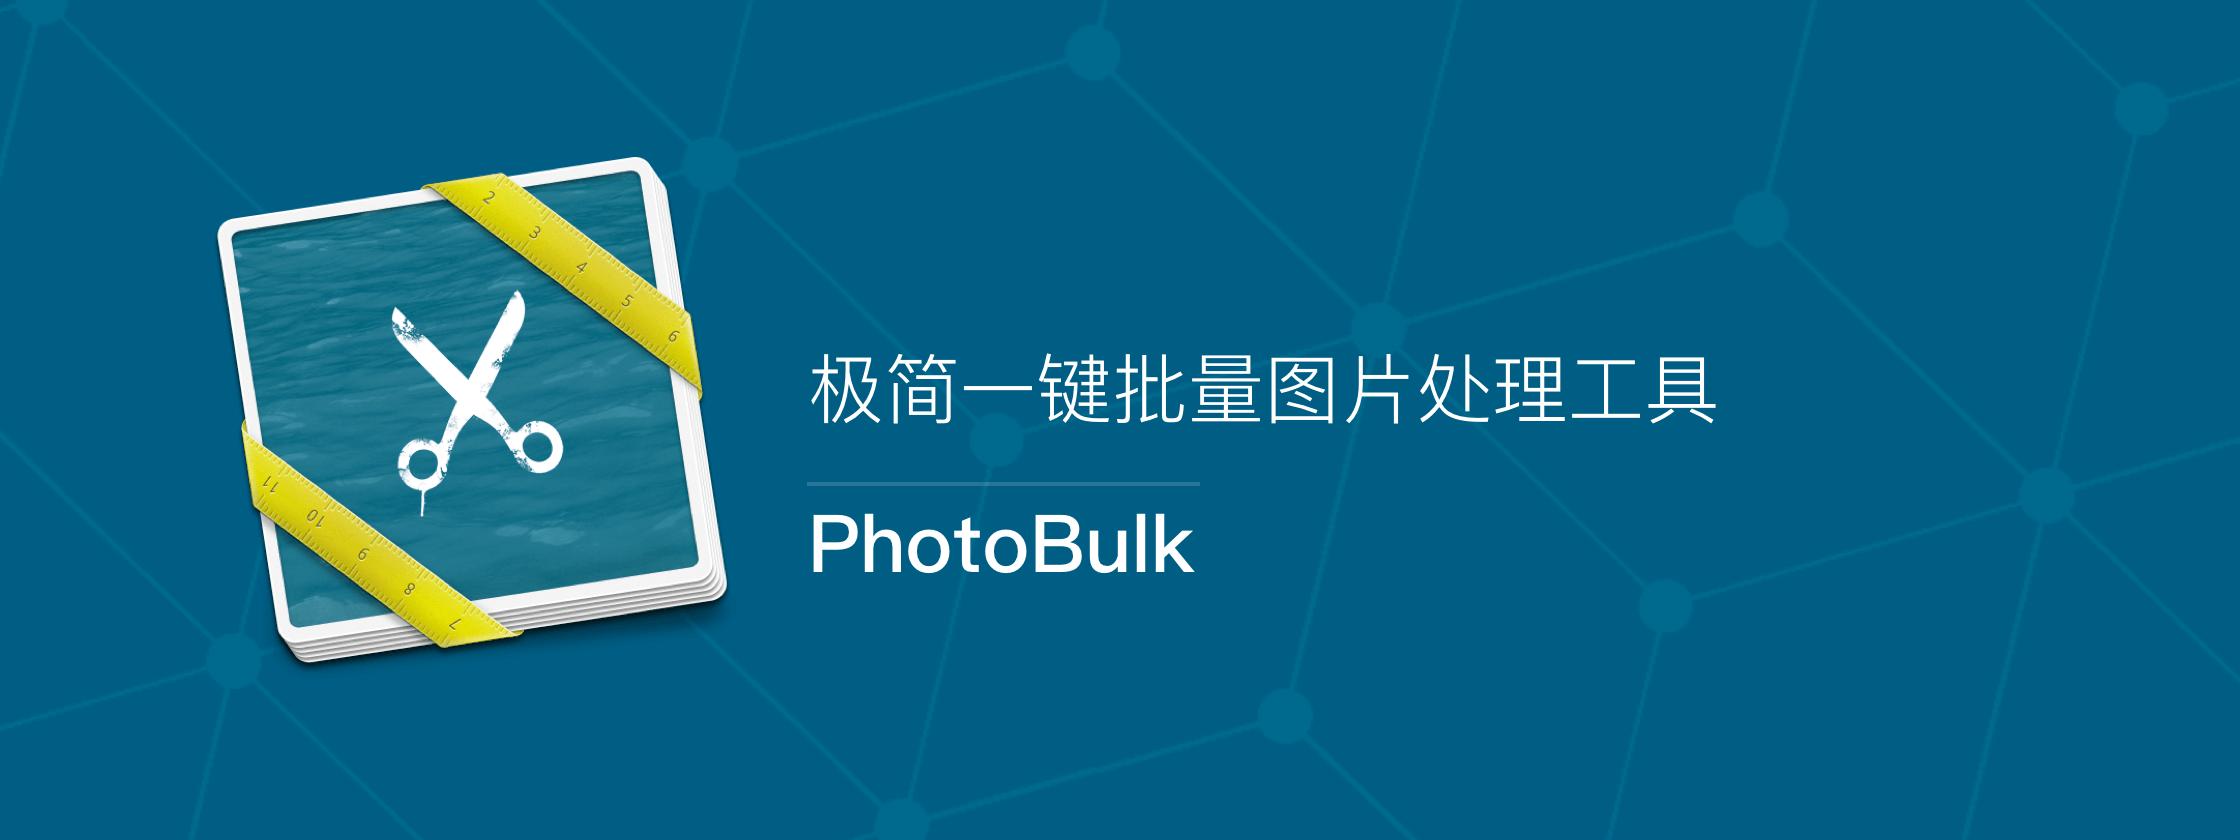 PhotoBulk – 极简一键批量图片处理工具